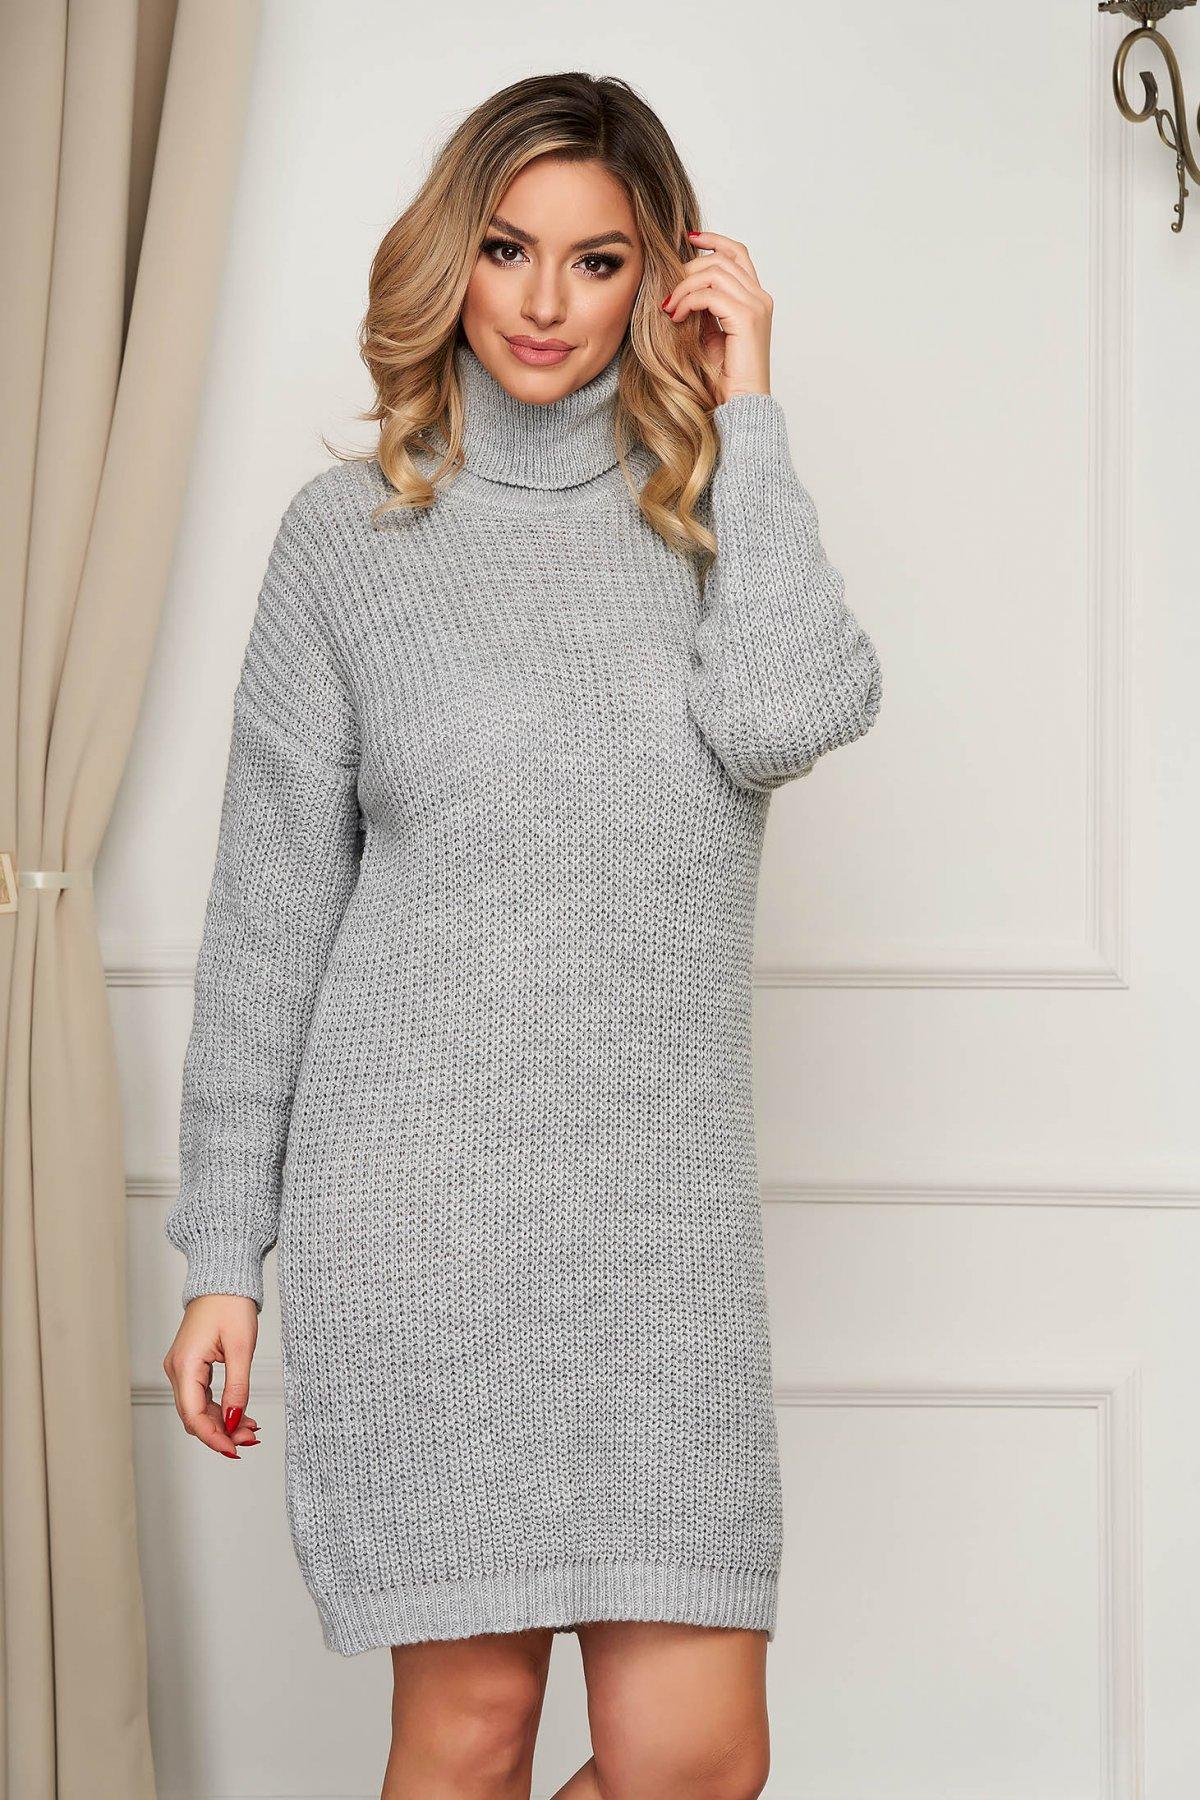 Rochie SunShine gri pe gat tricotata din material elastic cu croi larg - medelin.ro